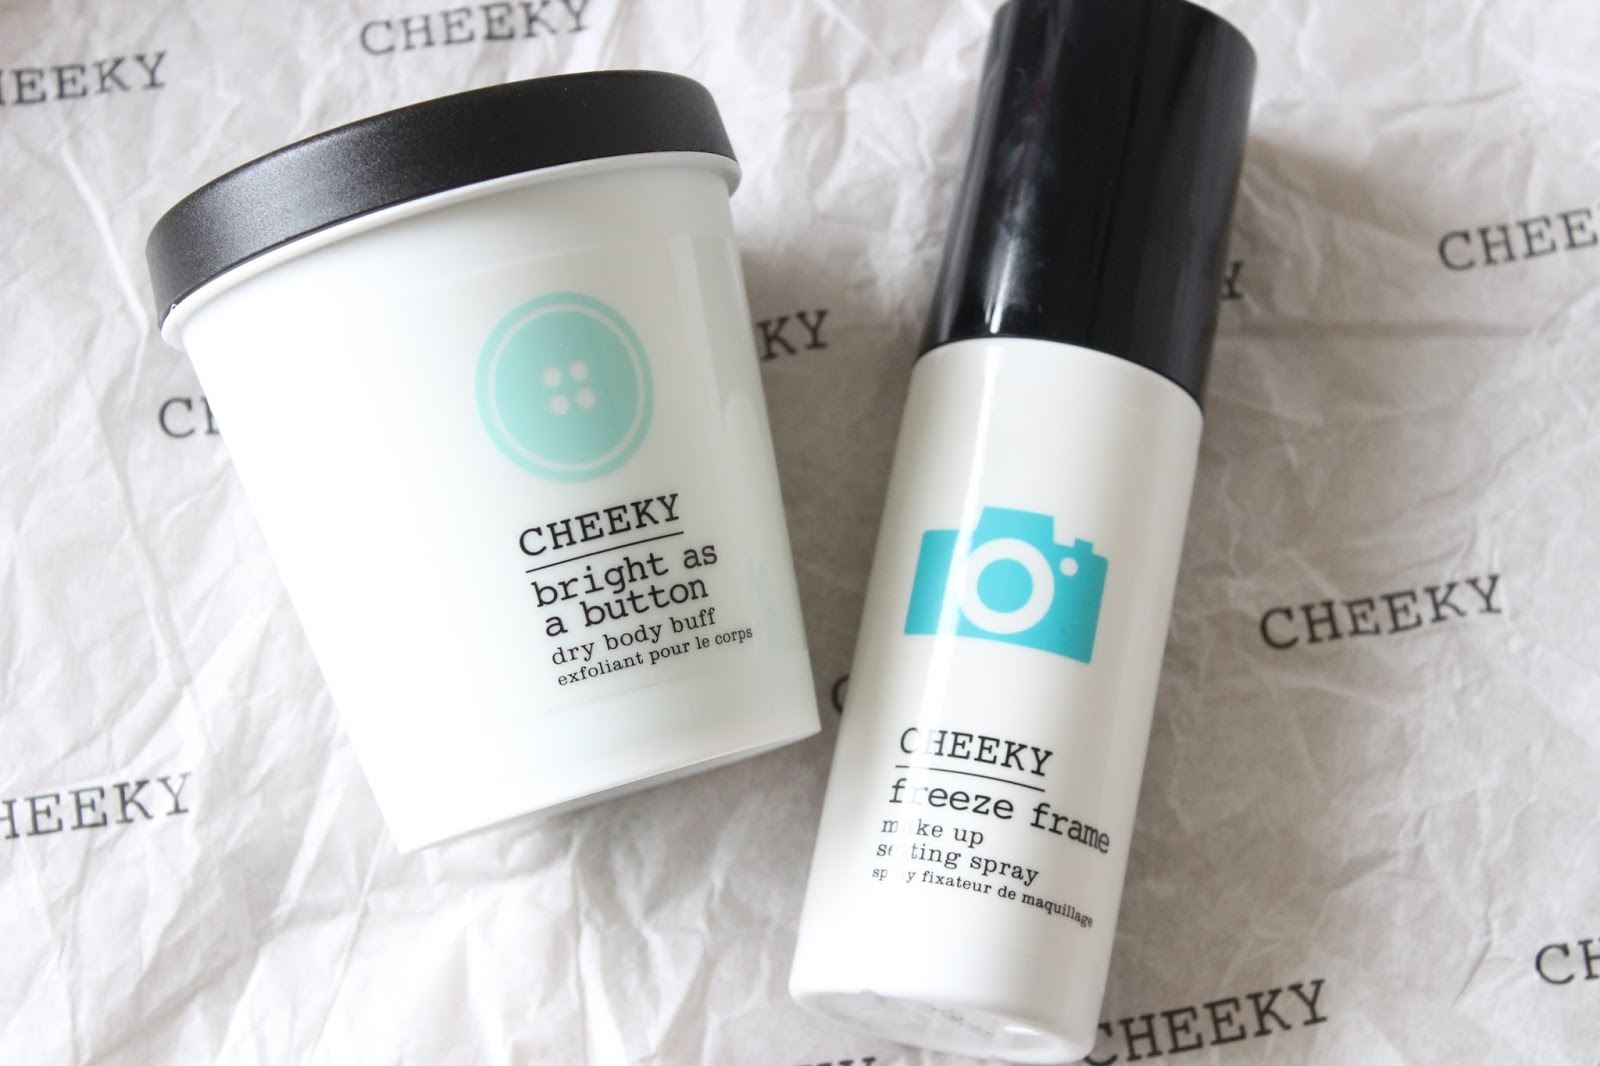 cheeky-freeze-frame-make-up-setting-spray